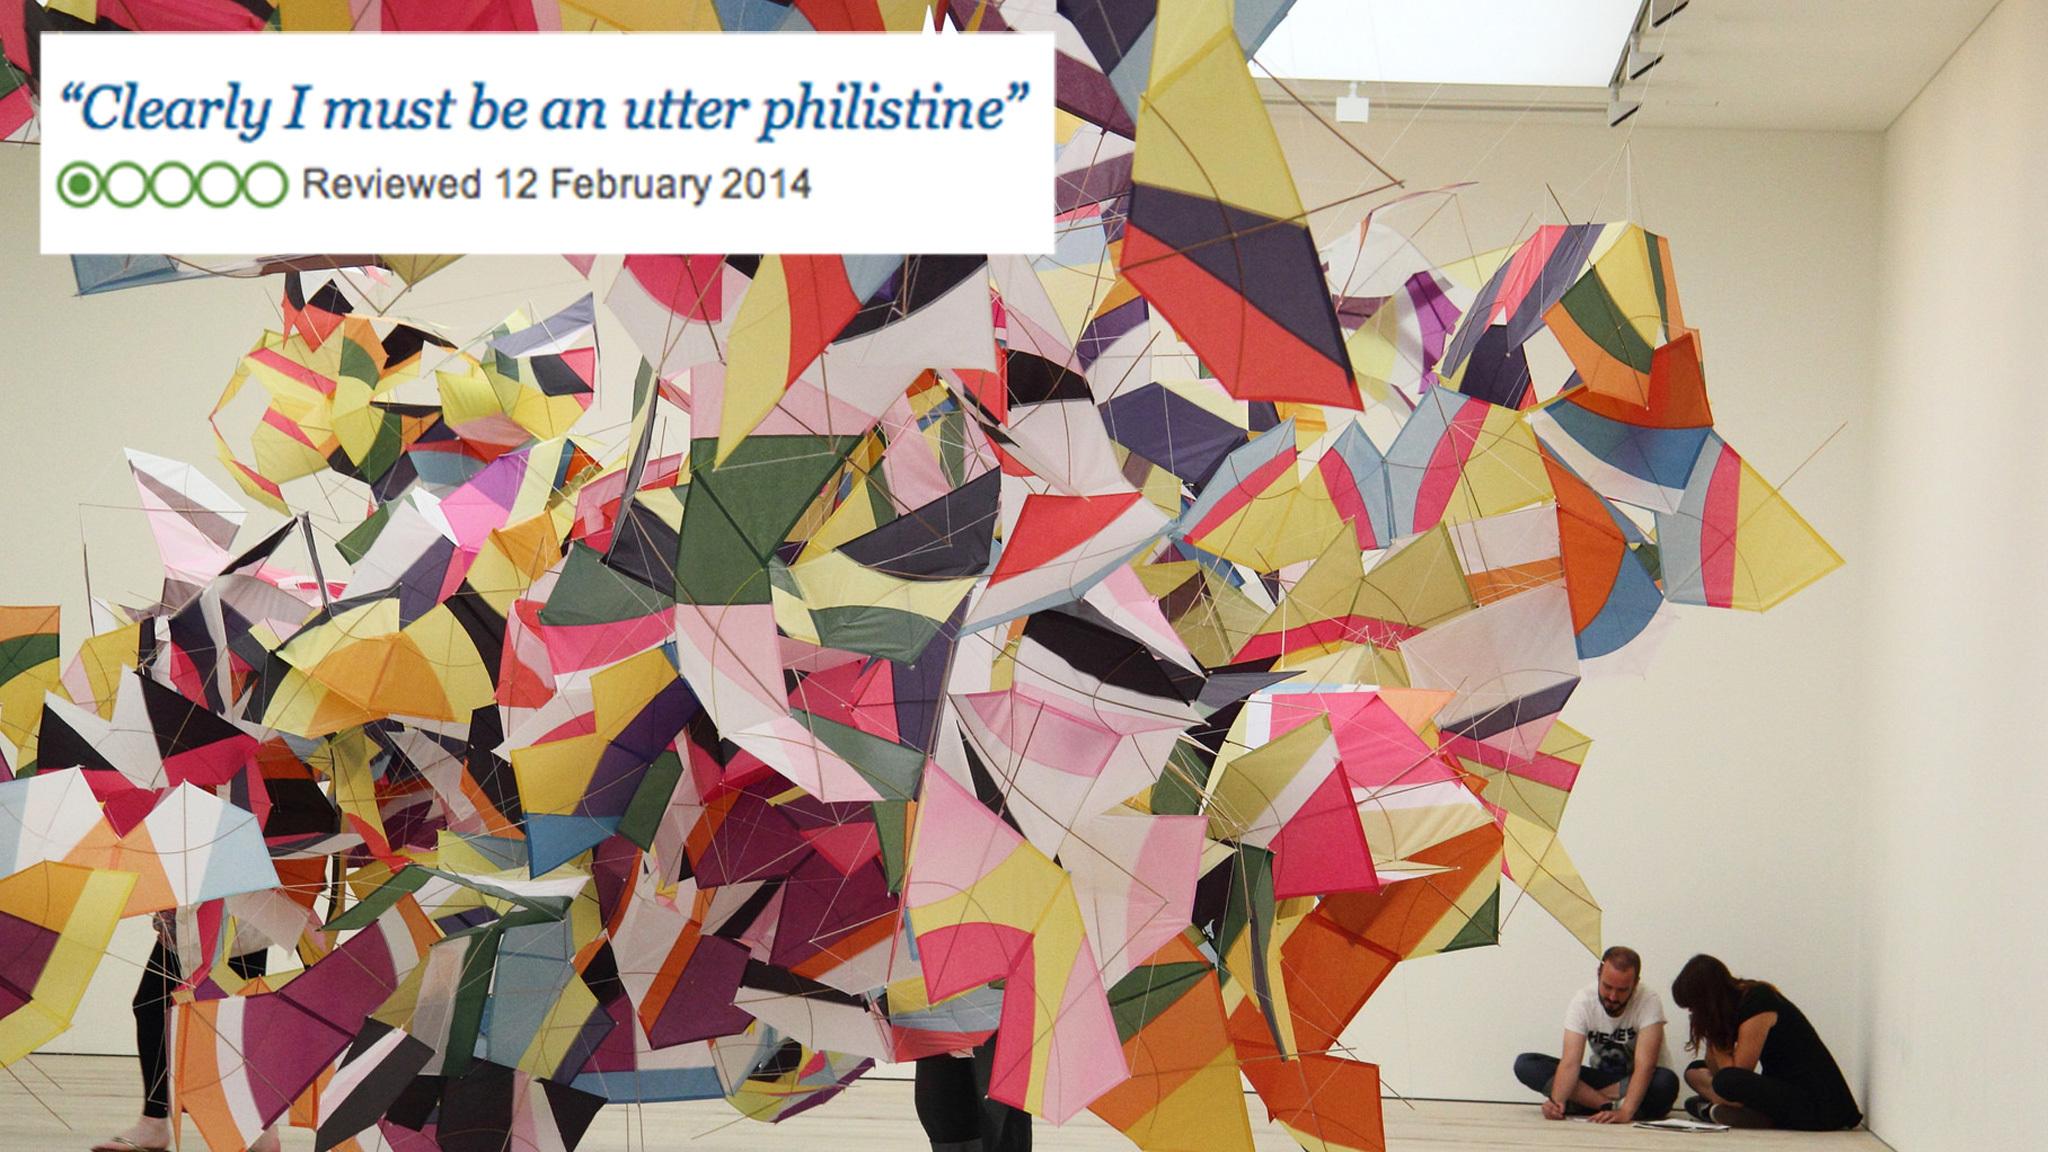 Saatchi Gallery TripAdvisor review